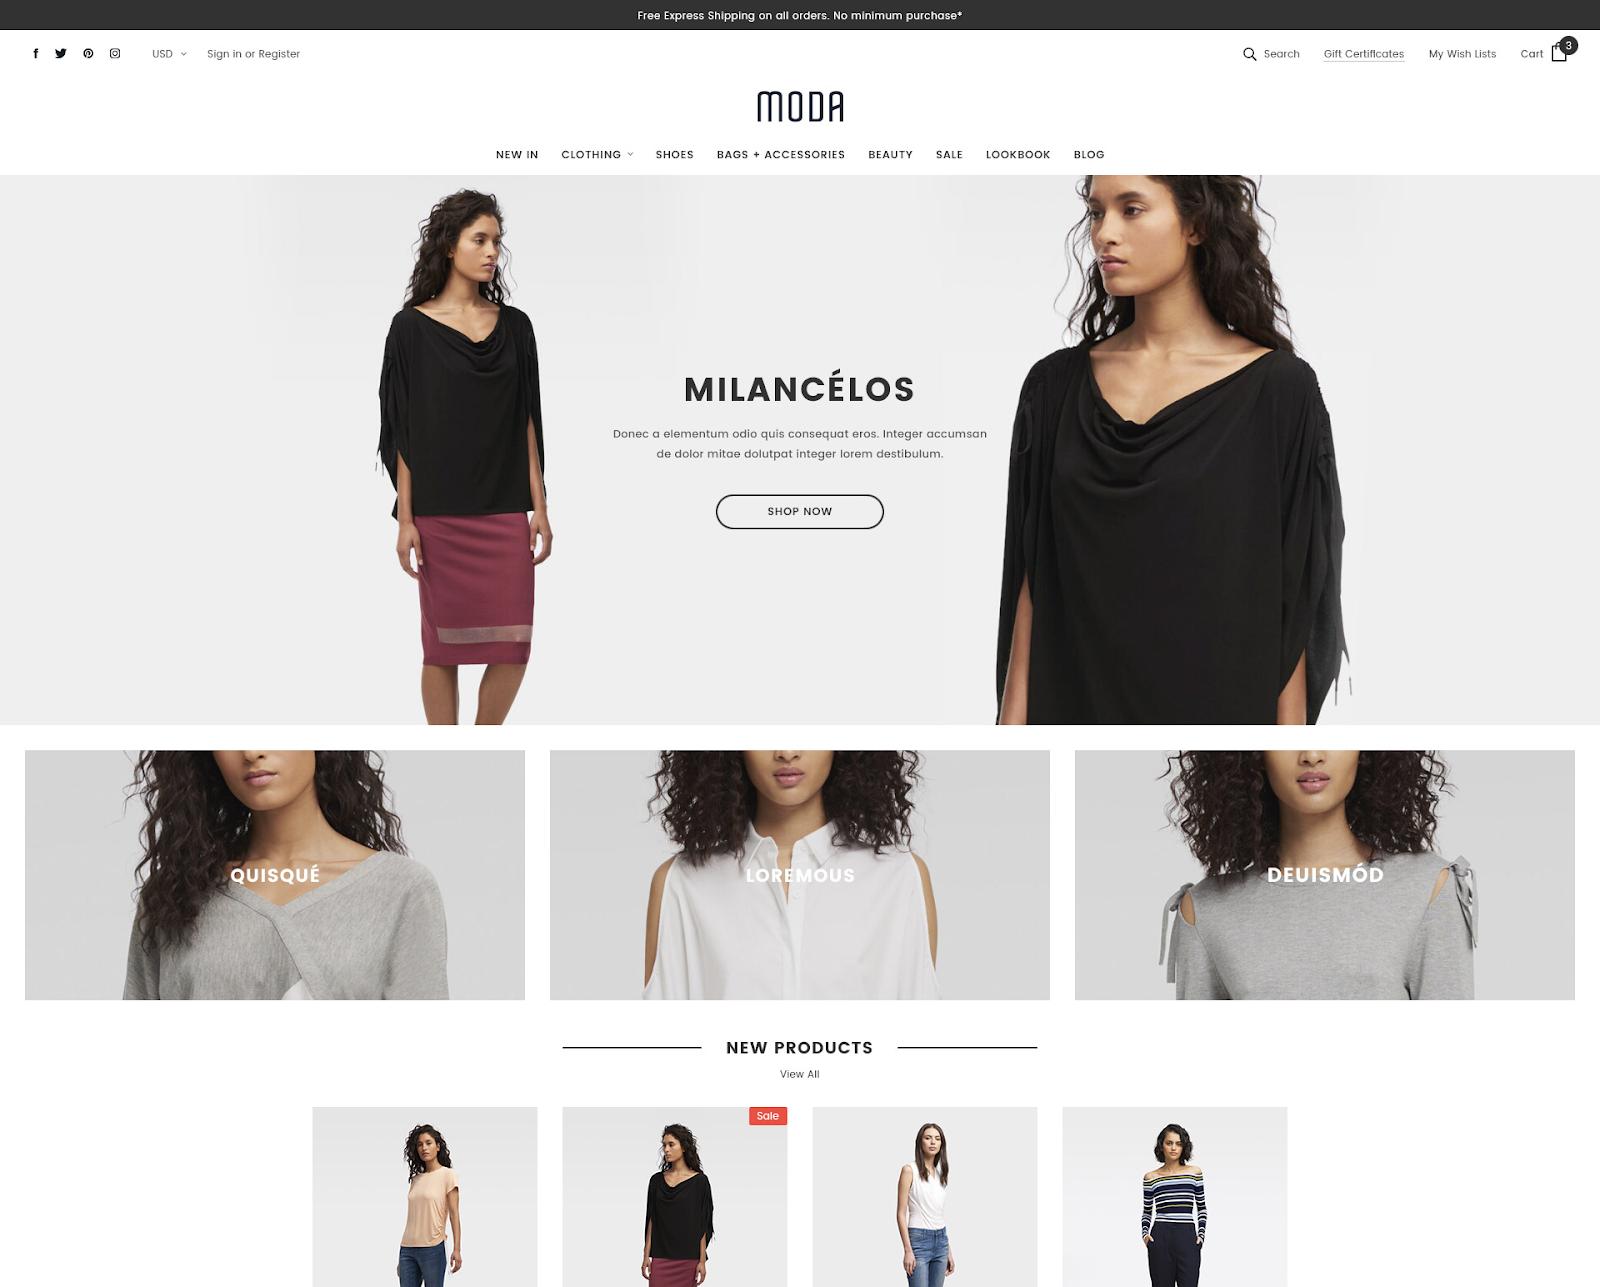 MODA BigCommerce theme